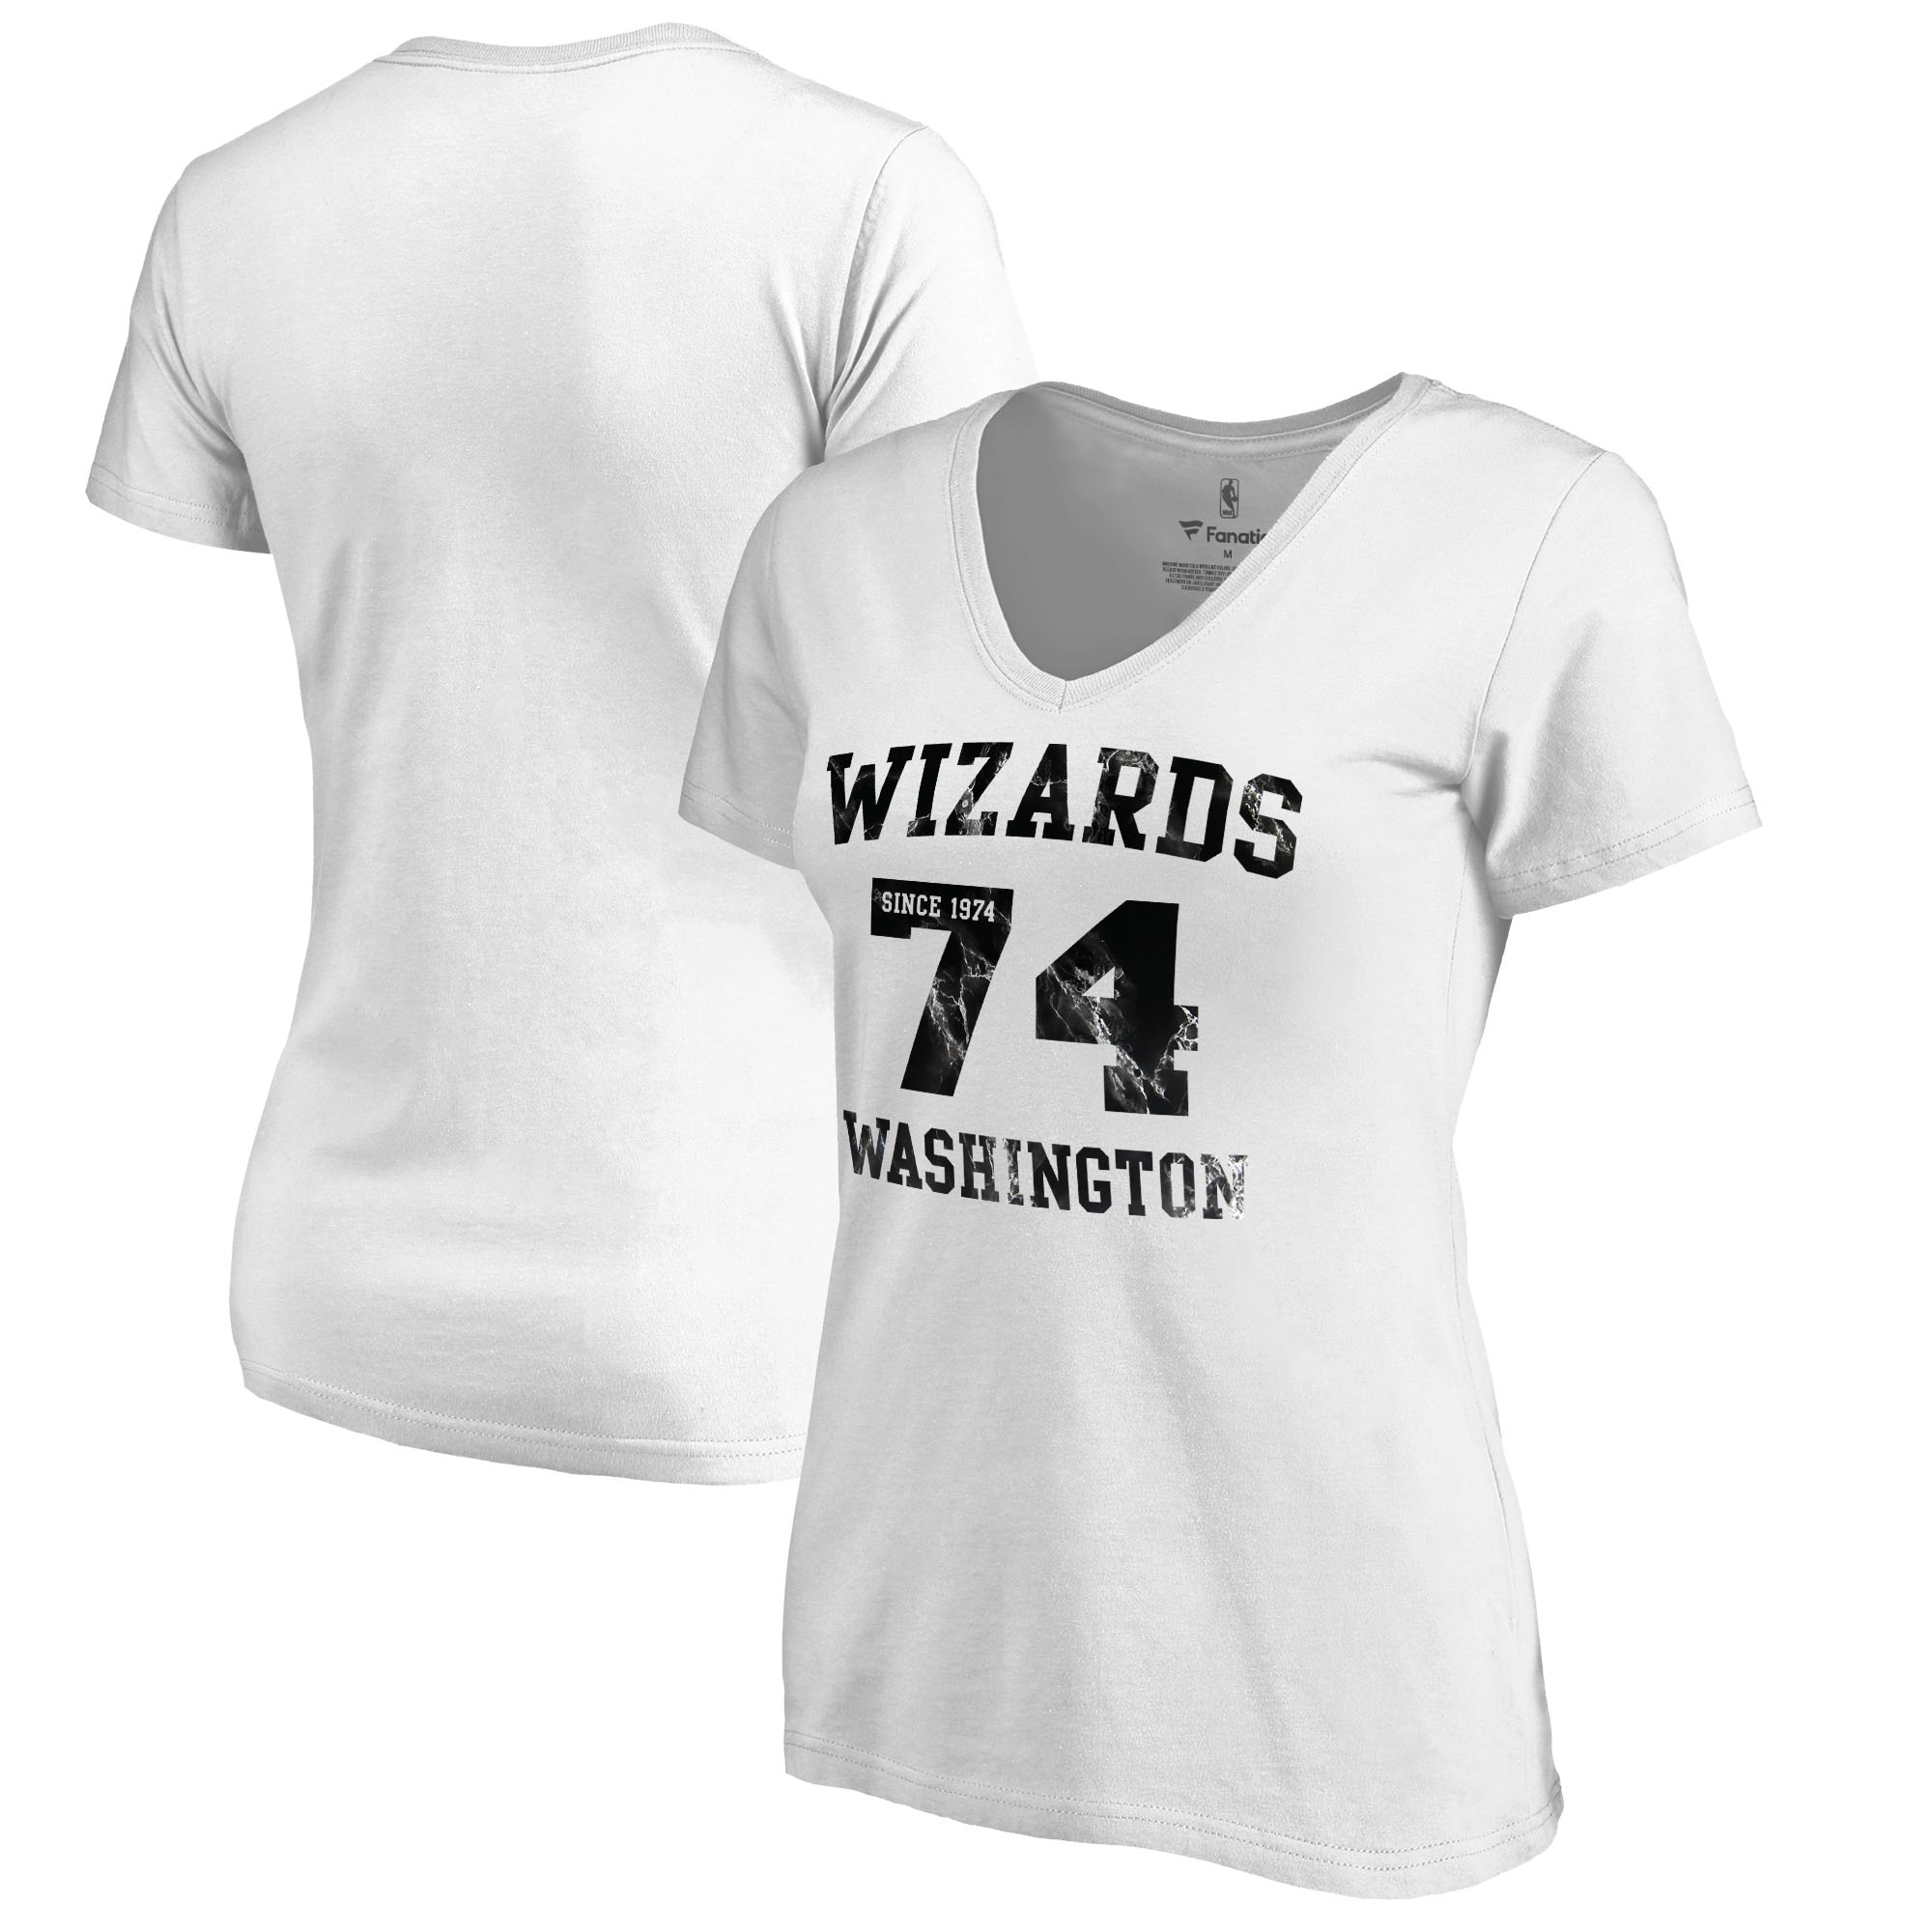 Washington Wizards Fanatics Branded Women's Hang Time Plus Size V-Neck T-Shirt - White